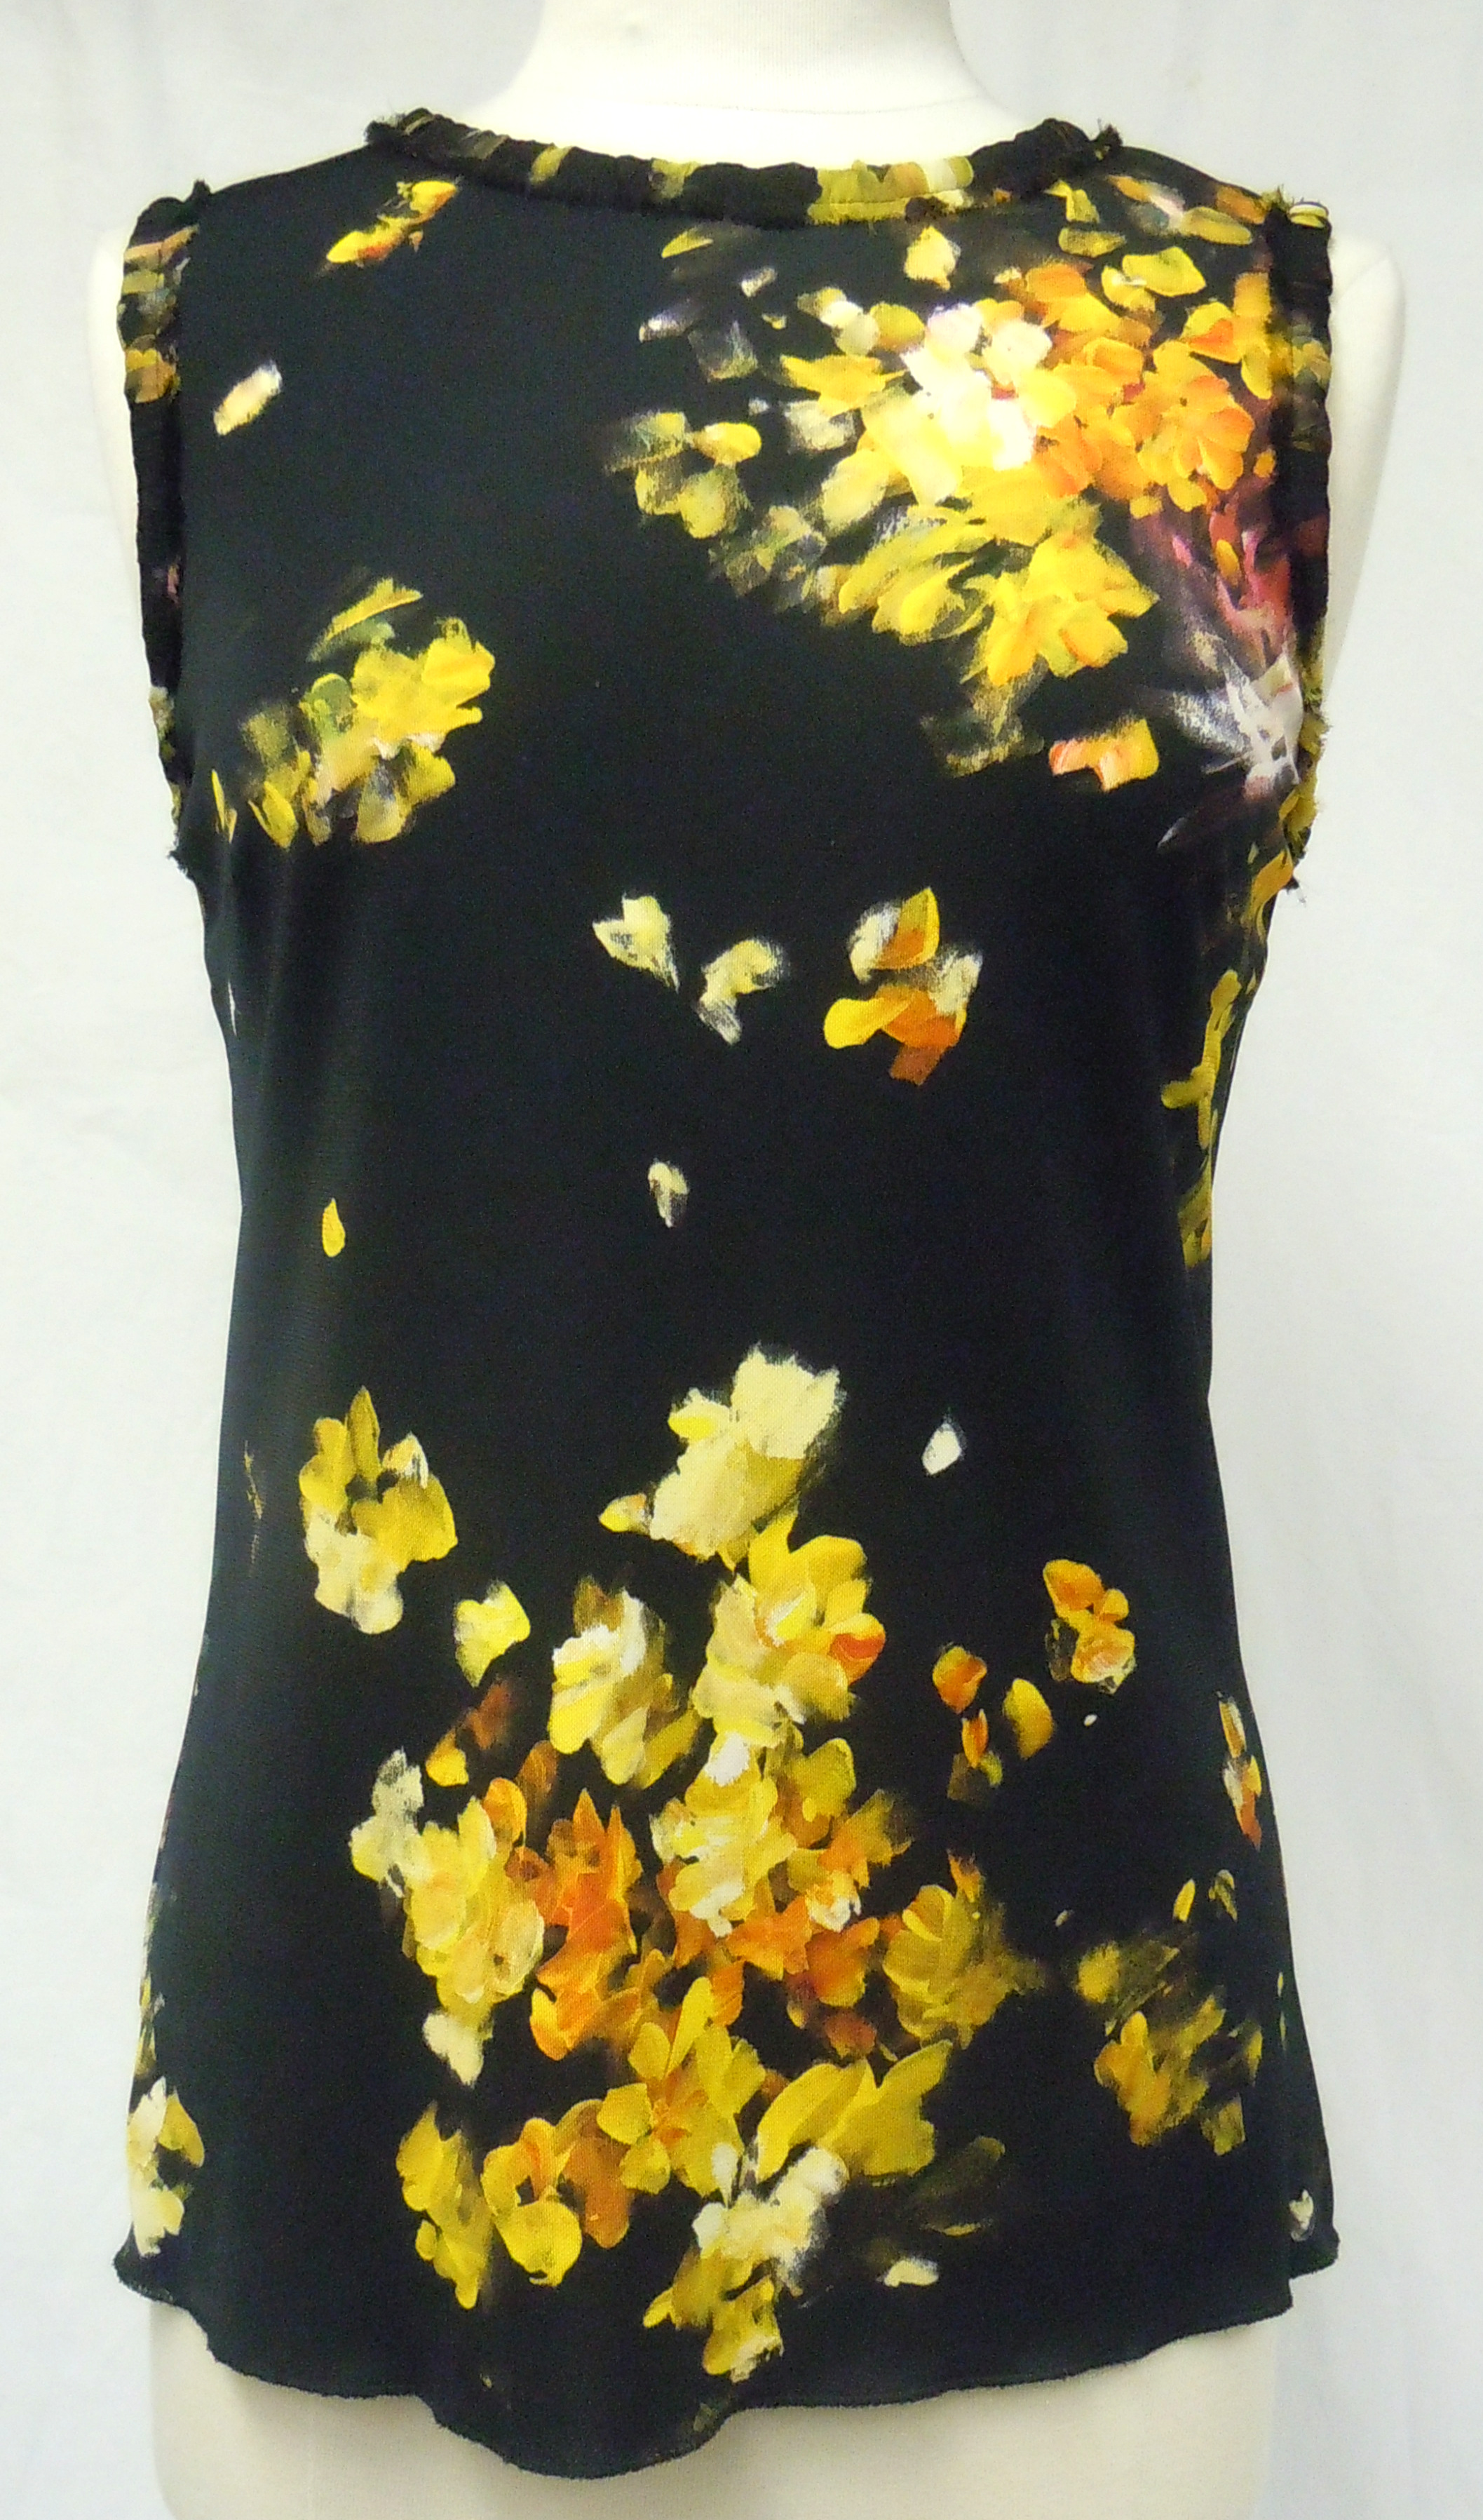 Dolce & Gabbana- Floral Top